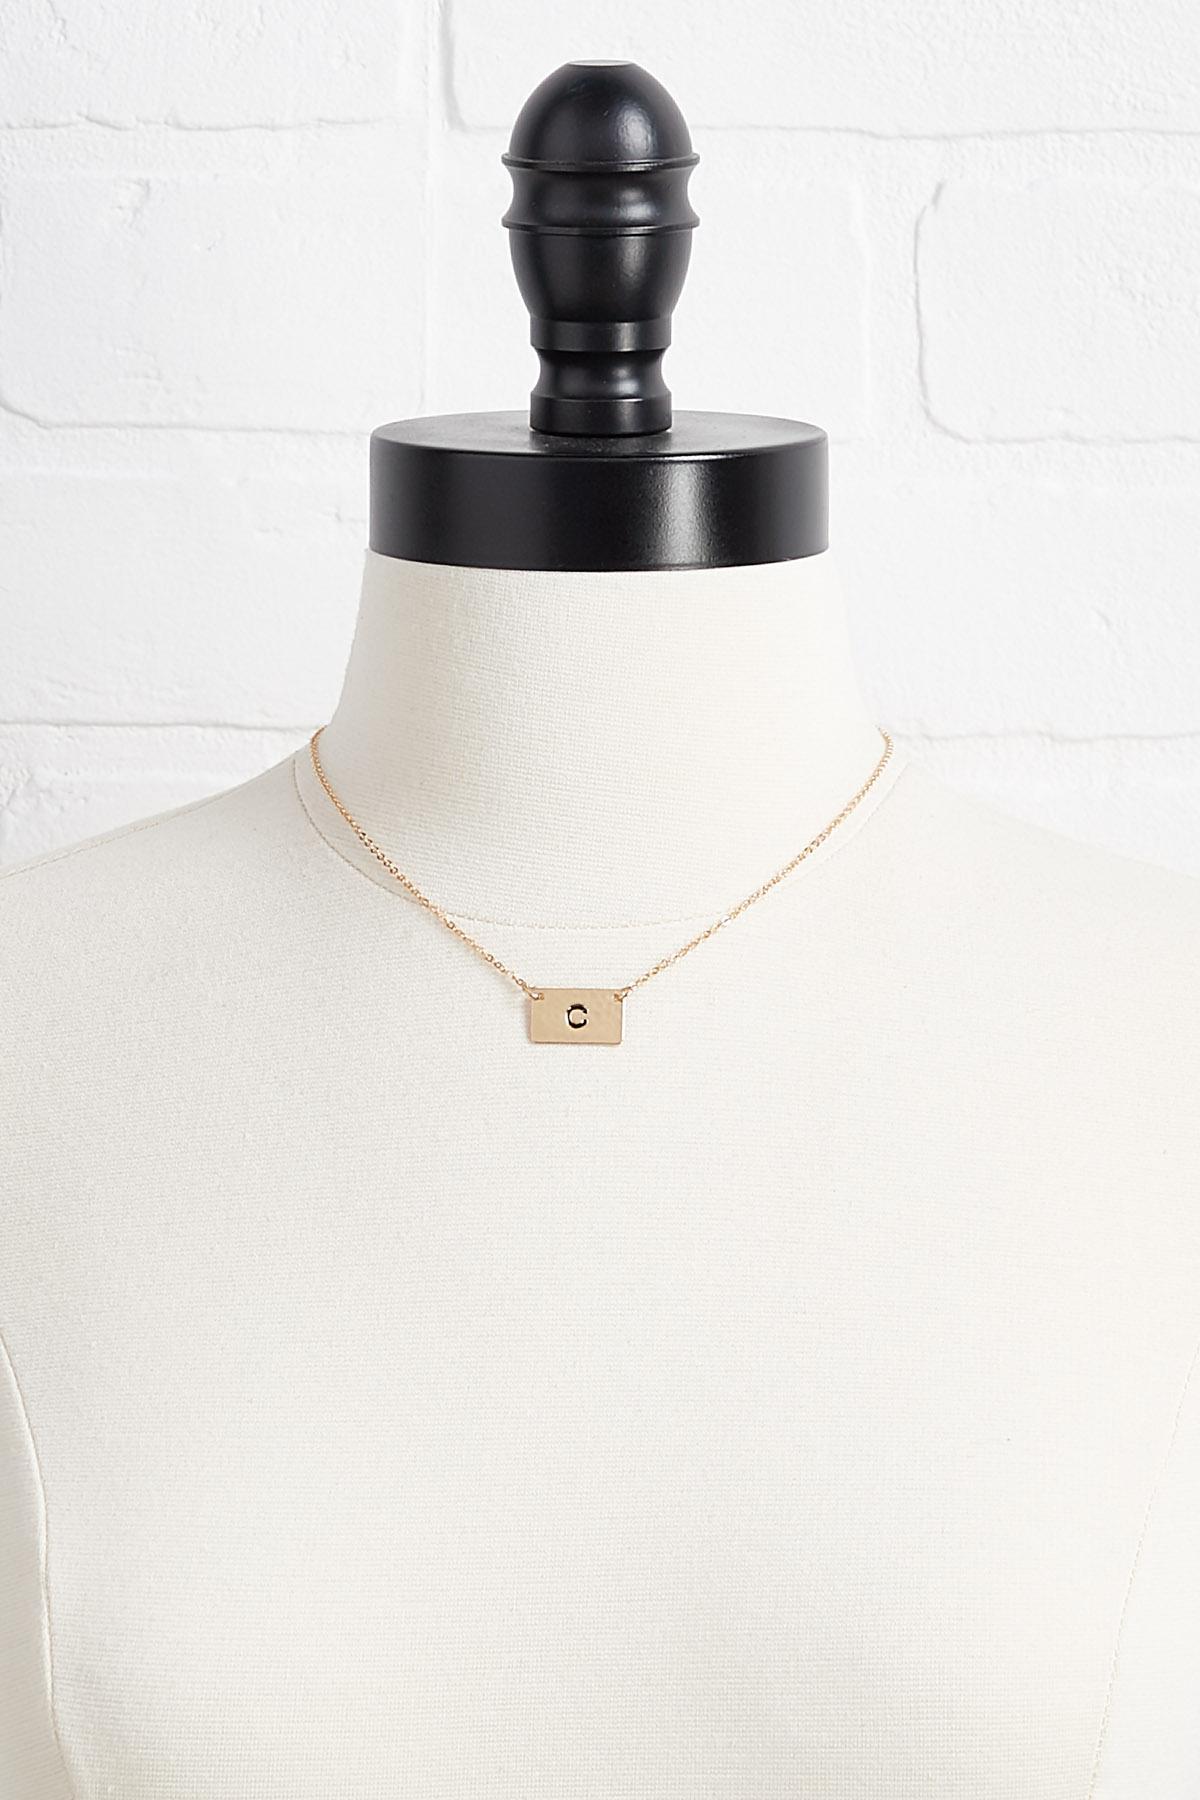 C Initial Pendant Necklace